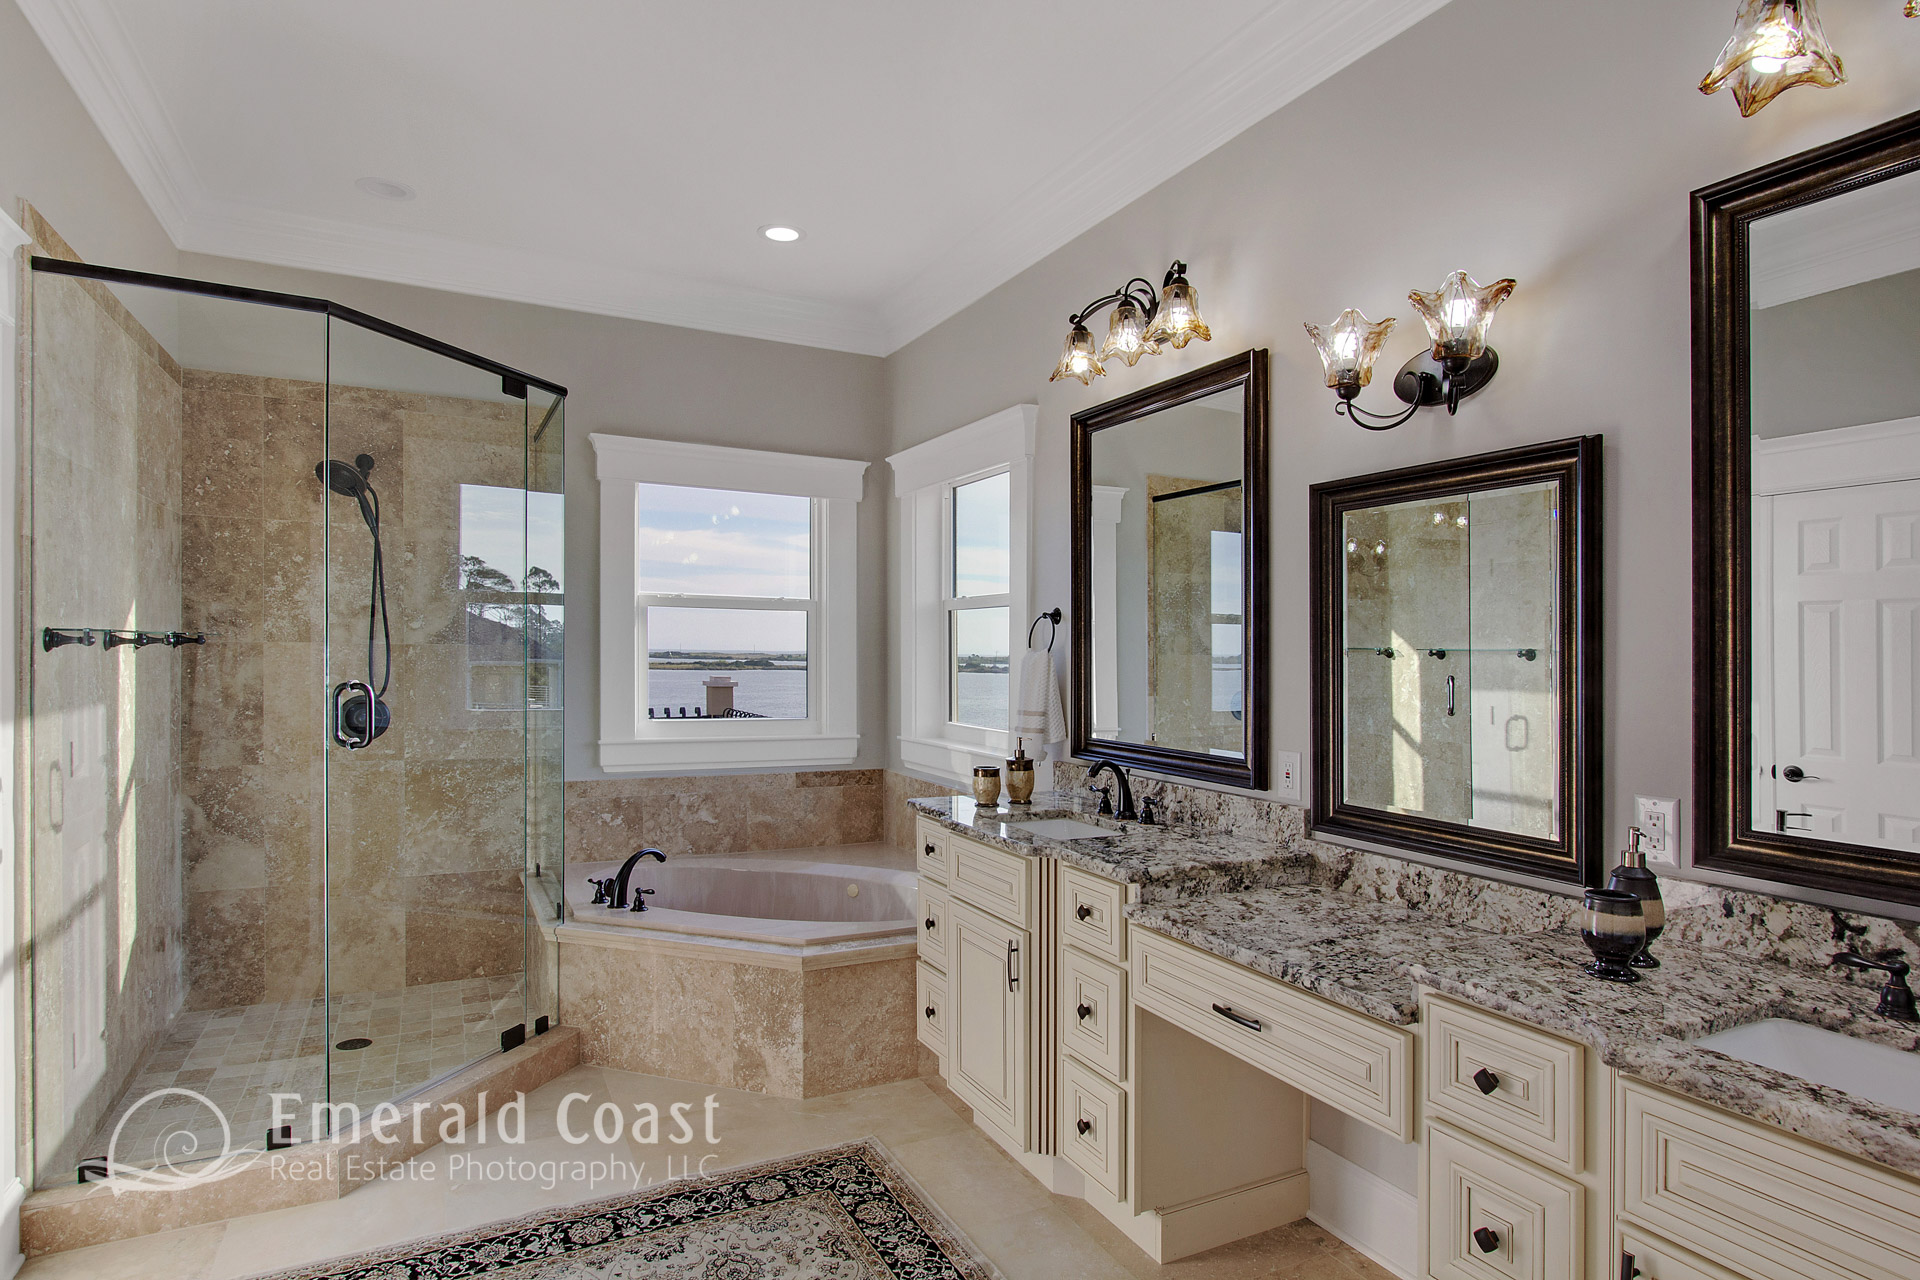 Emerald Coast Real Estate Photography » Fort Walton Beach ...